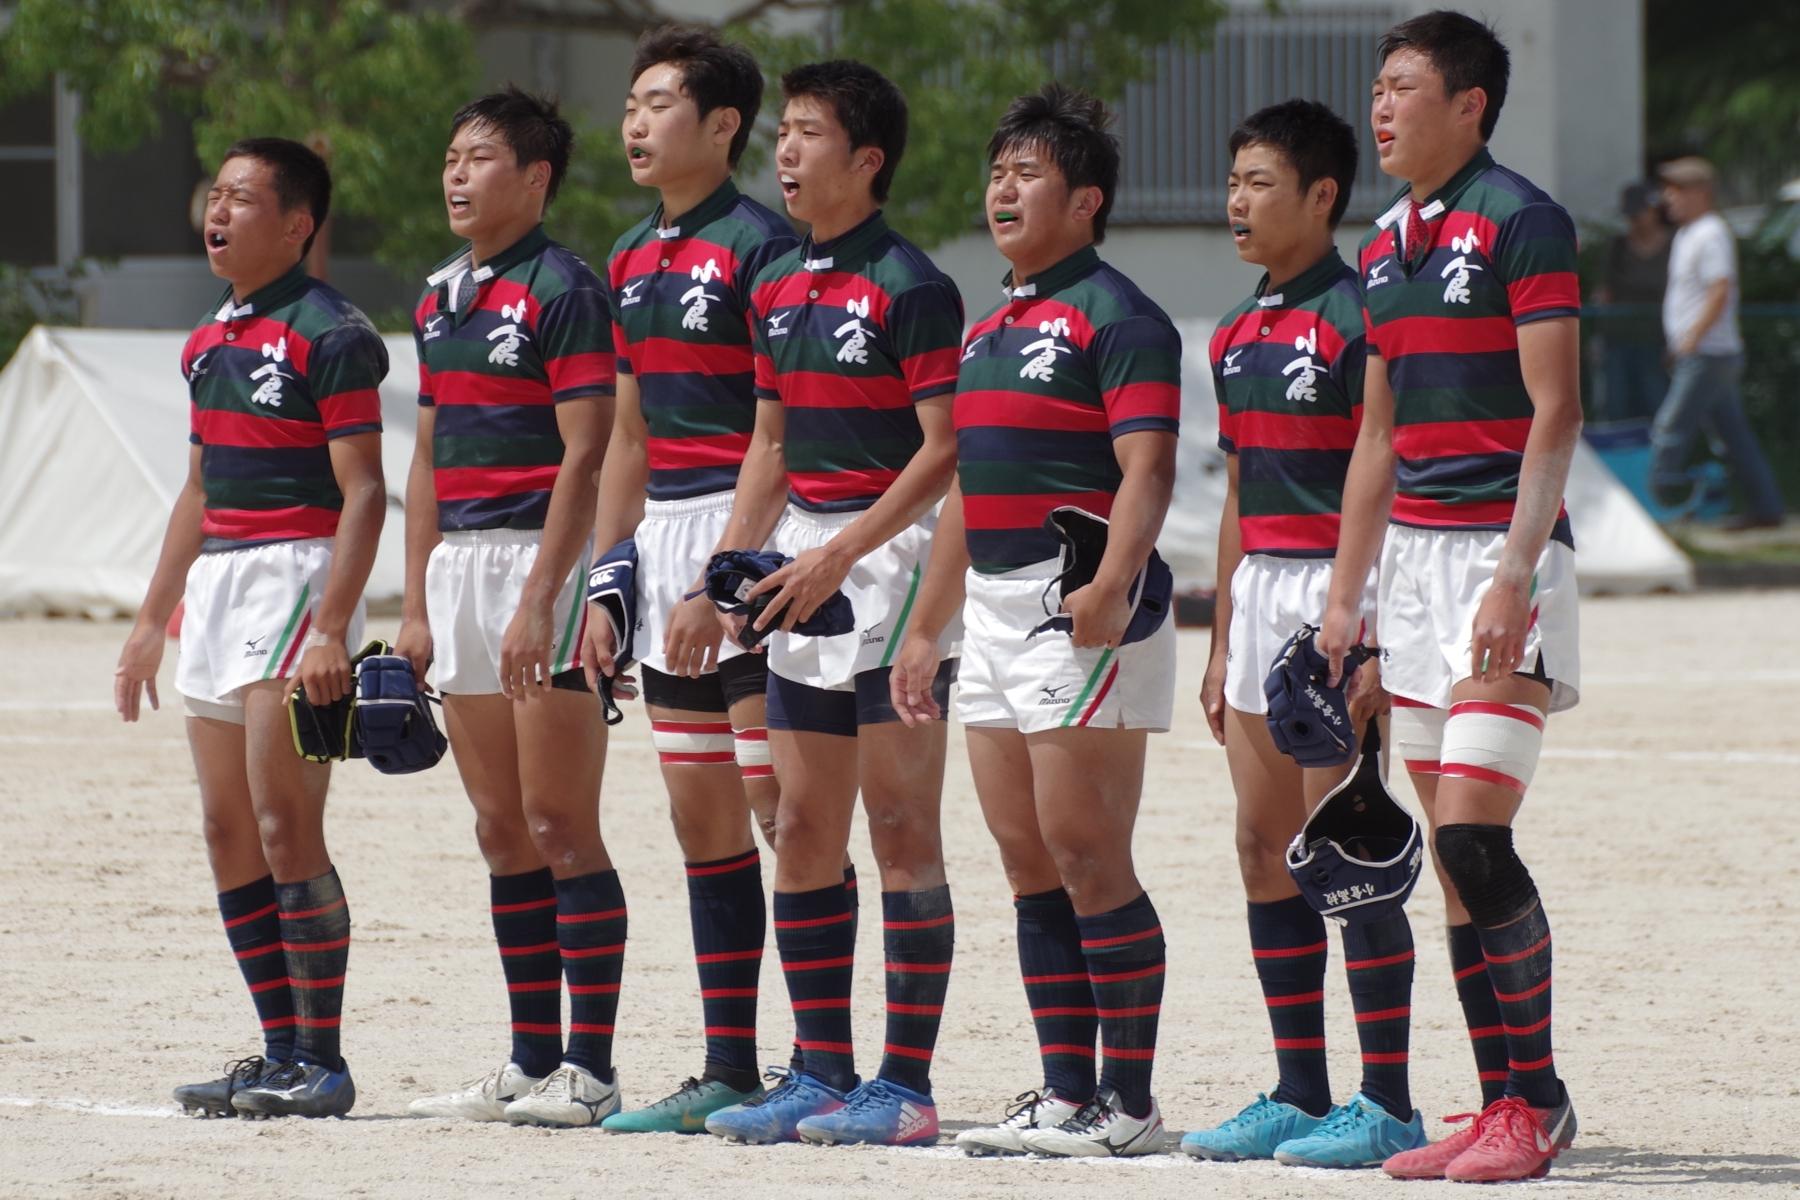 http://kokura-rugby.sakura.ne.jp/180527_102158_0222.jpg